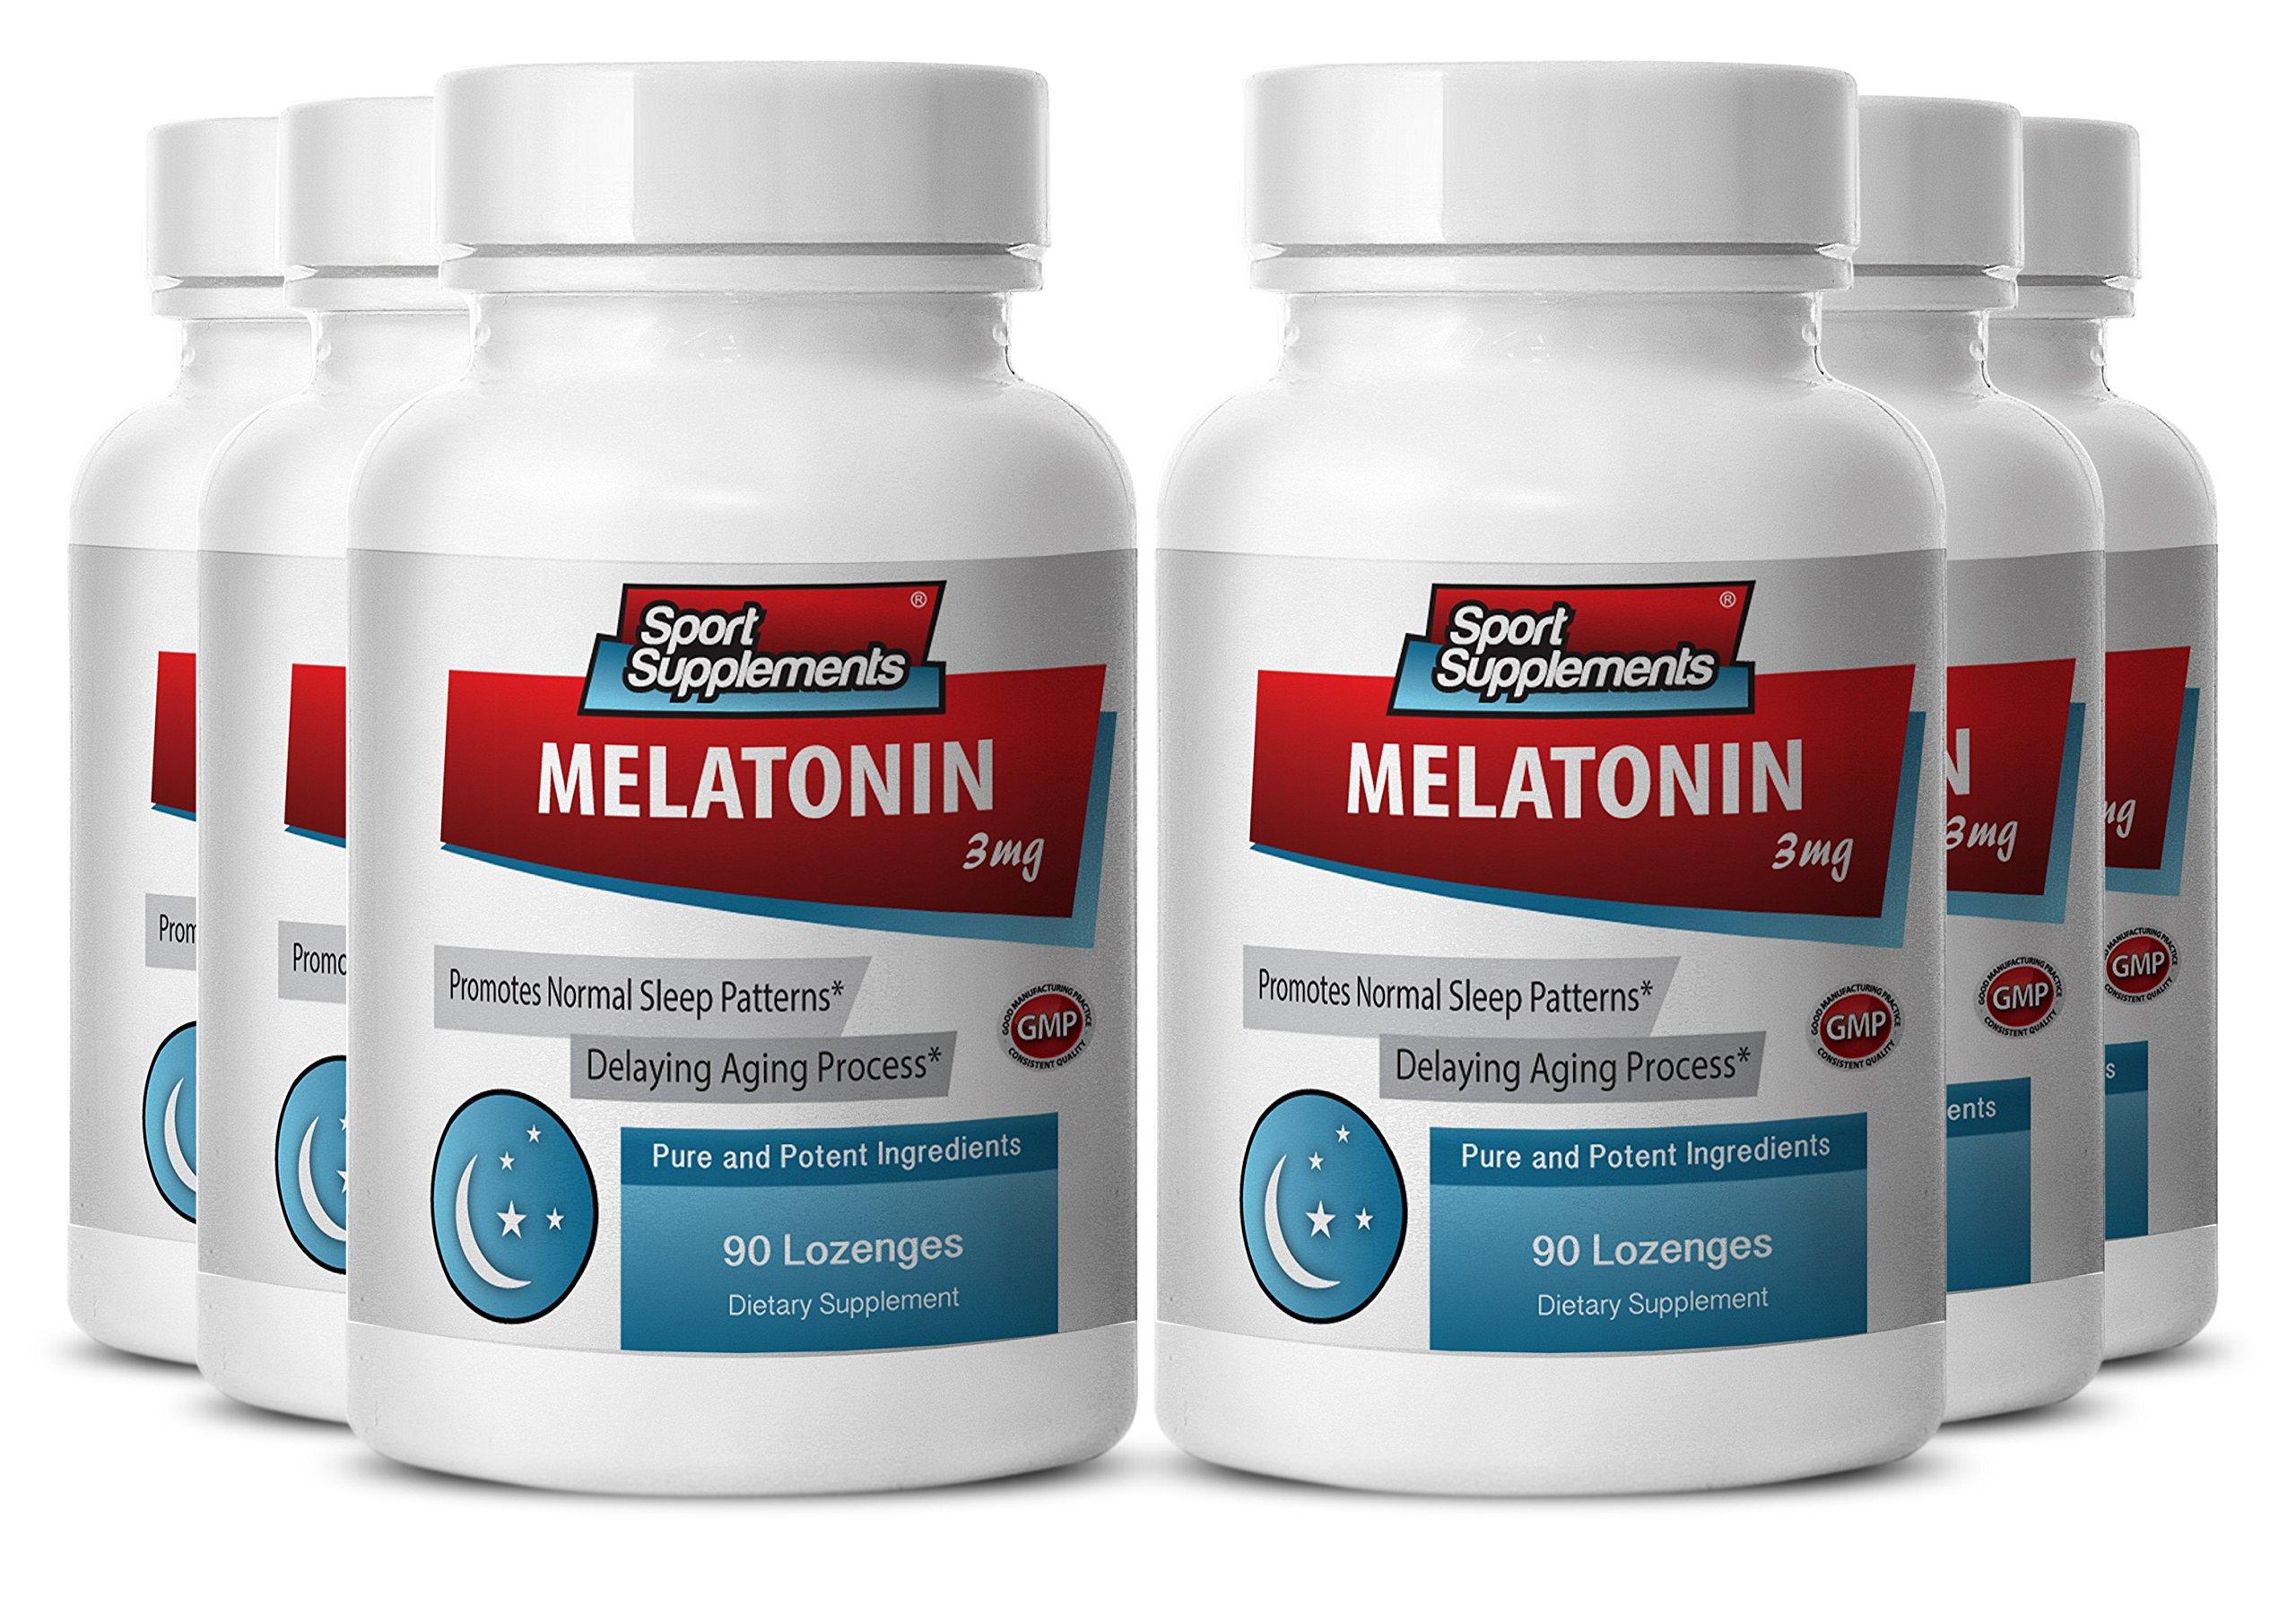 Melatonin vital nutrients - Melatonin 3mg - Helps fight insomnia - Helps fight migraines (6 Bottles - 540 Lozenges)